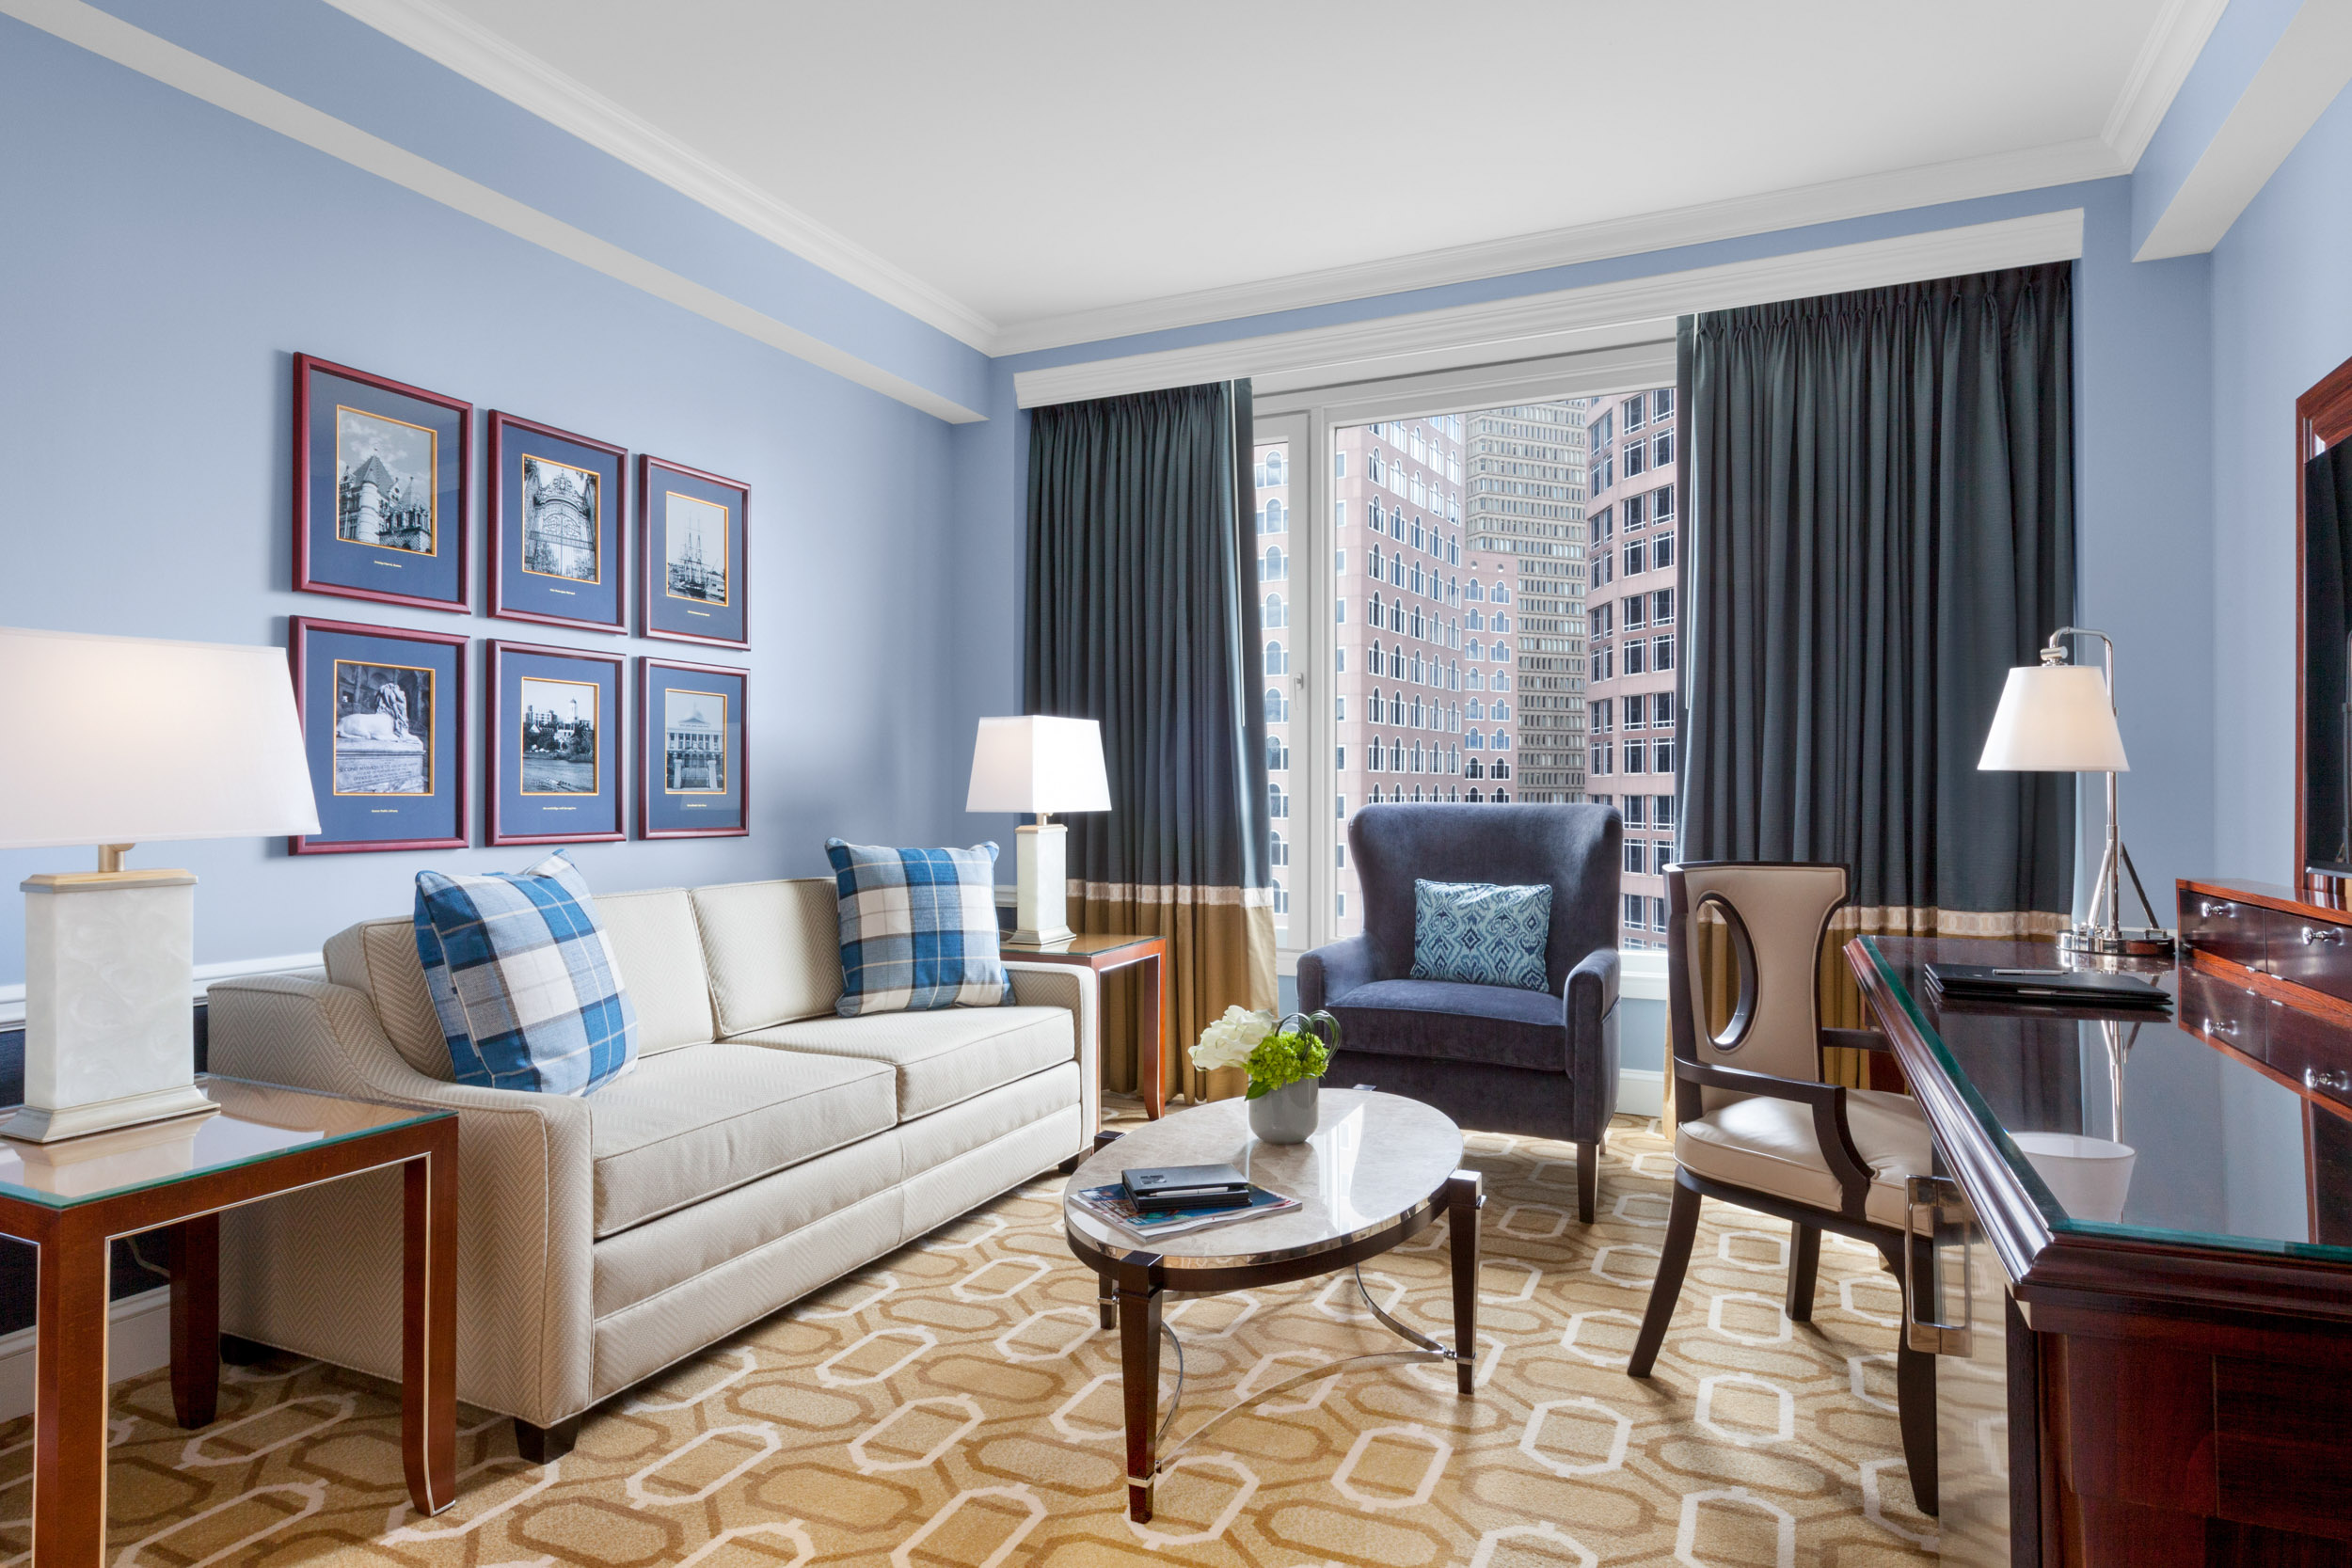 Boston Harbor Hotel room service photographed by Adam DeTour